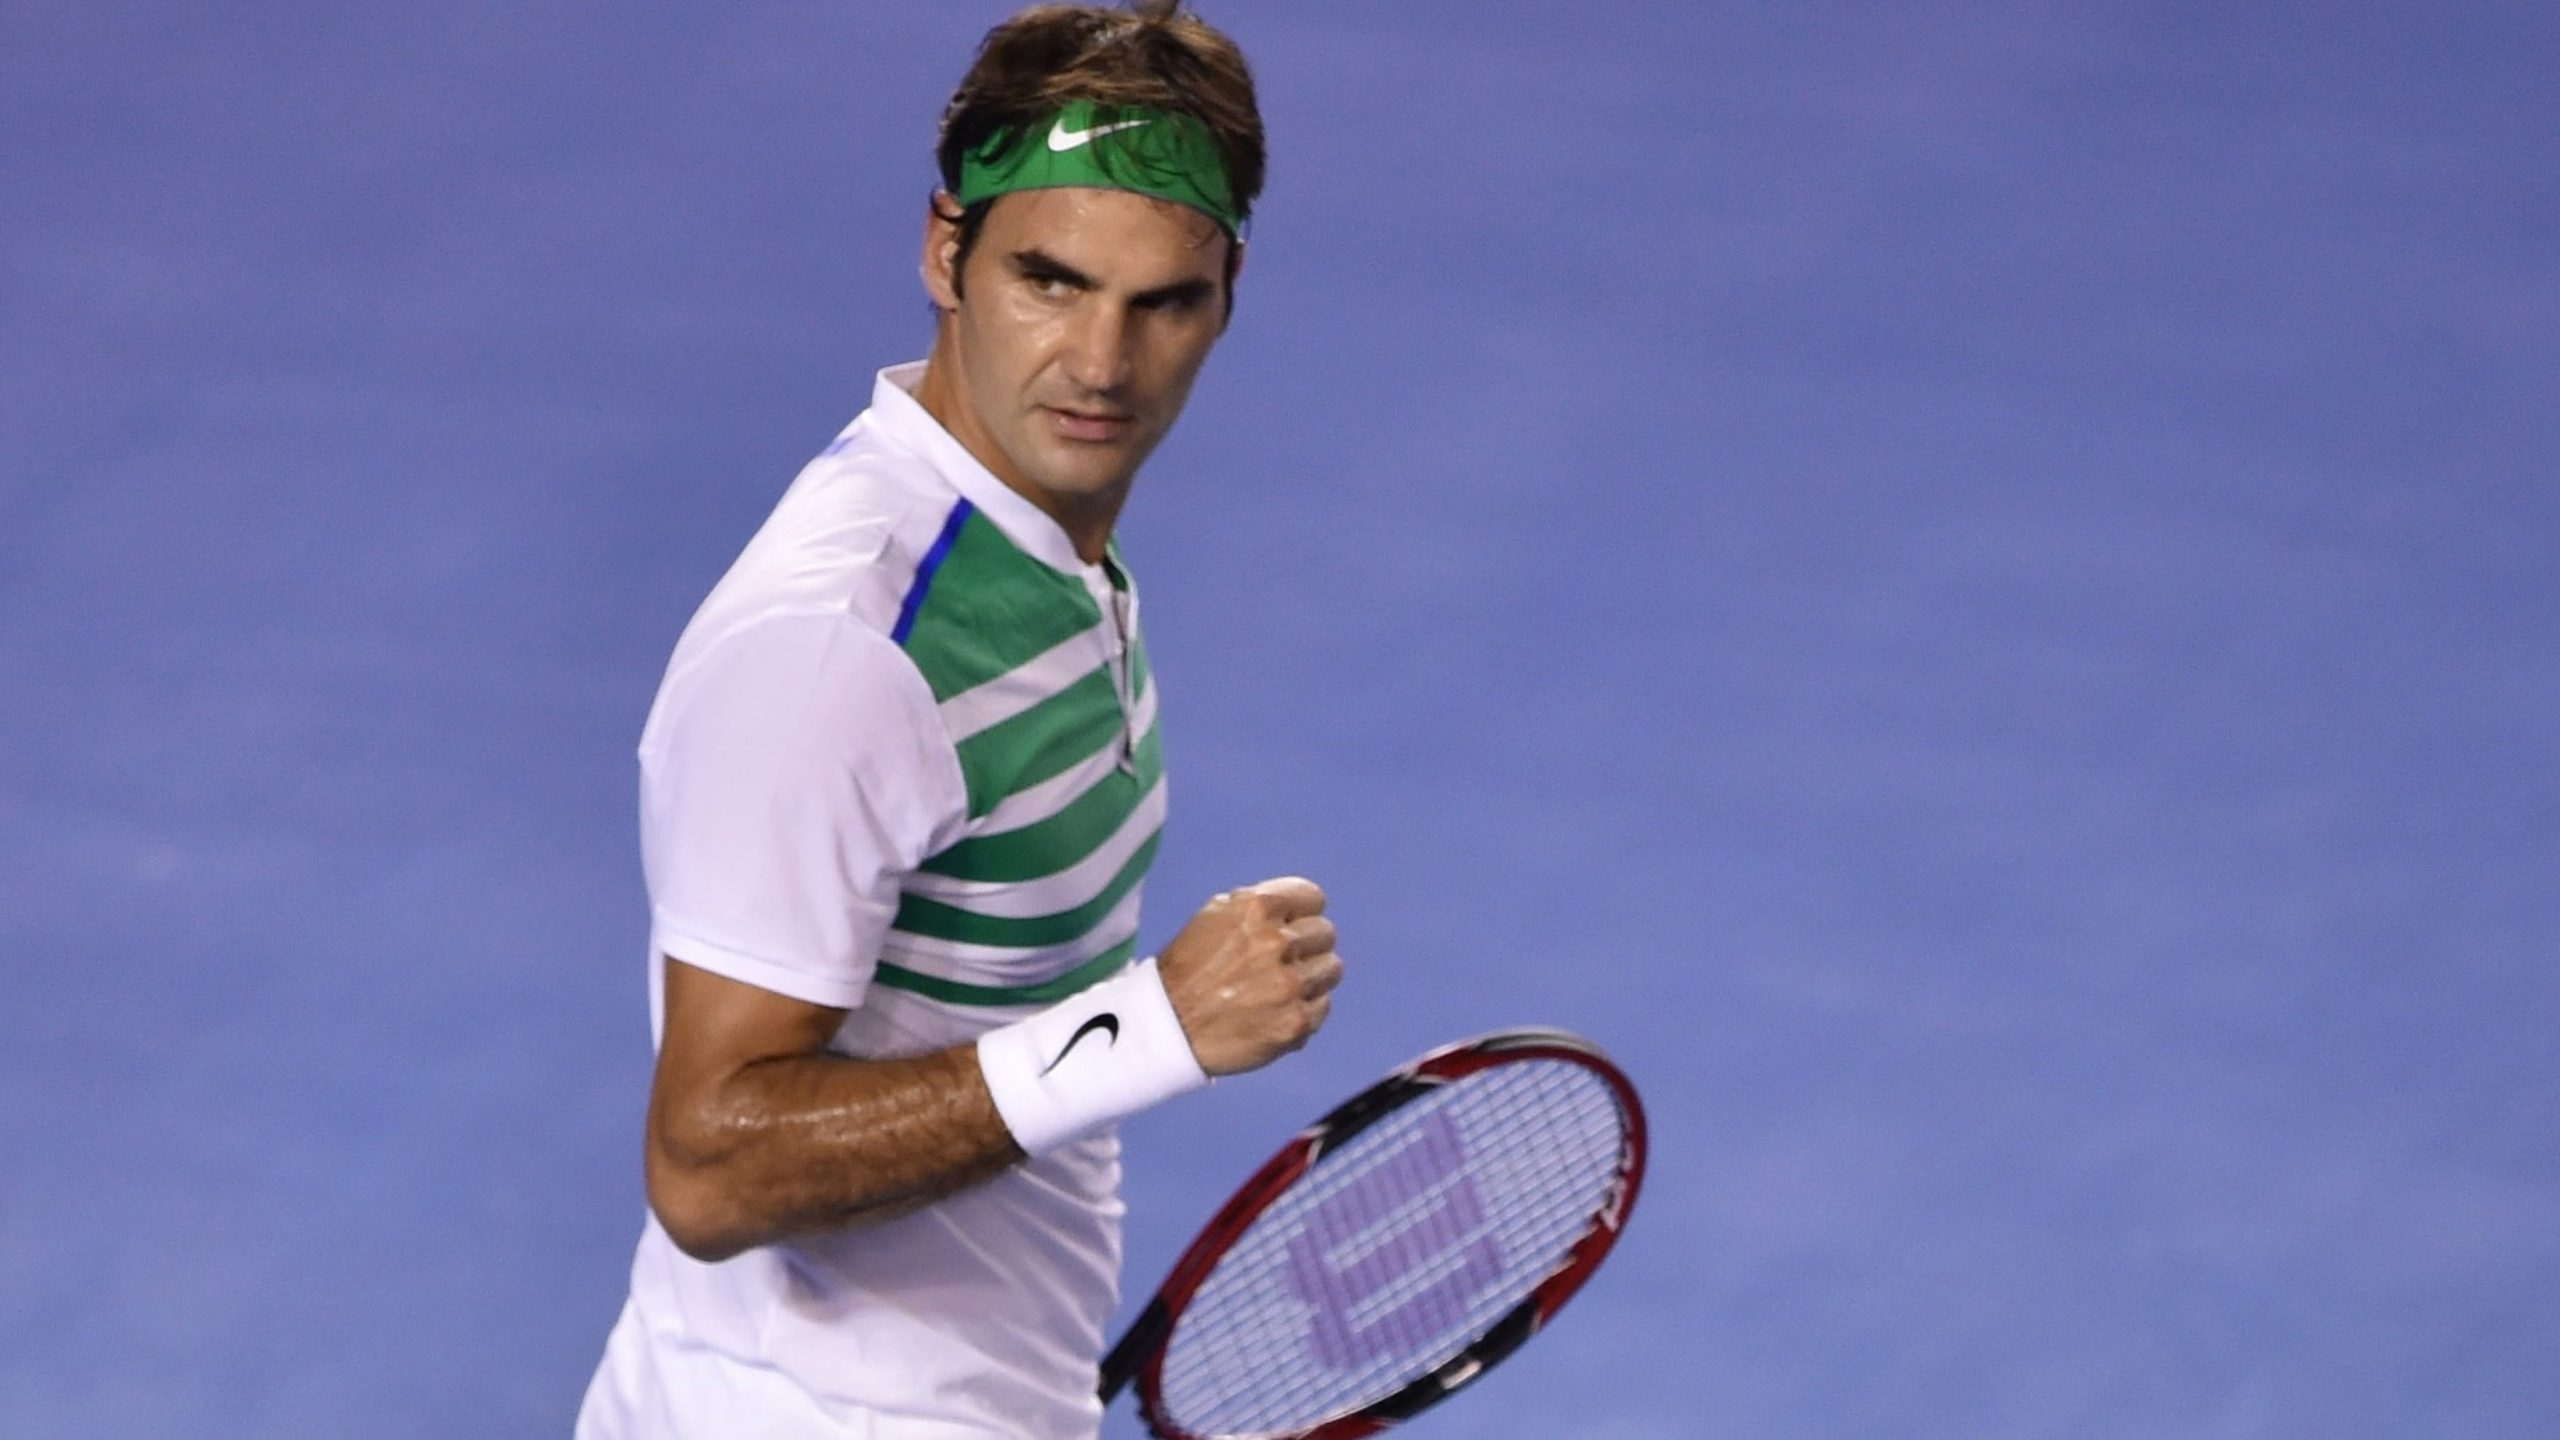 Roger Federer Free Wallpapers